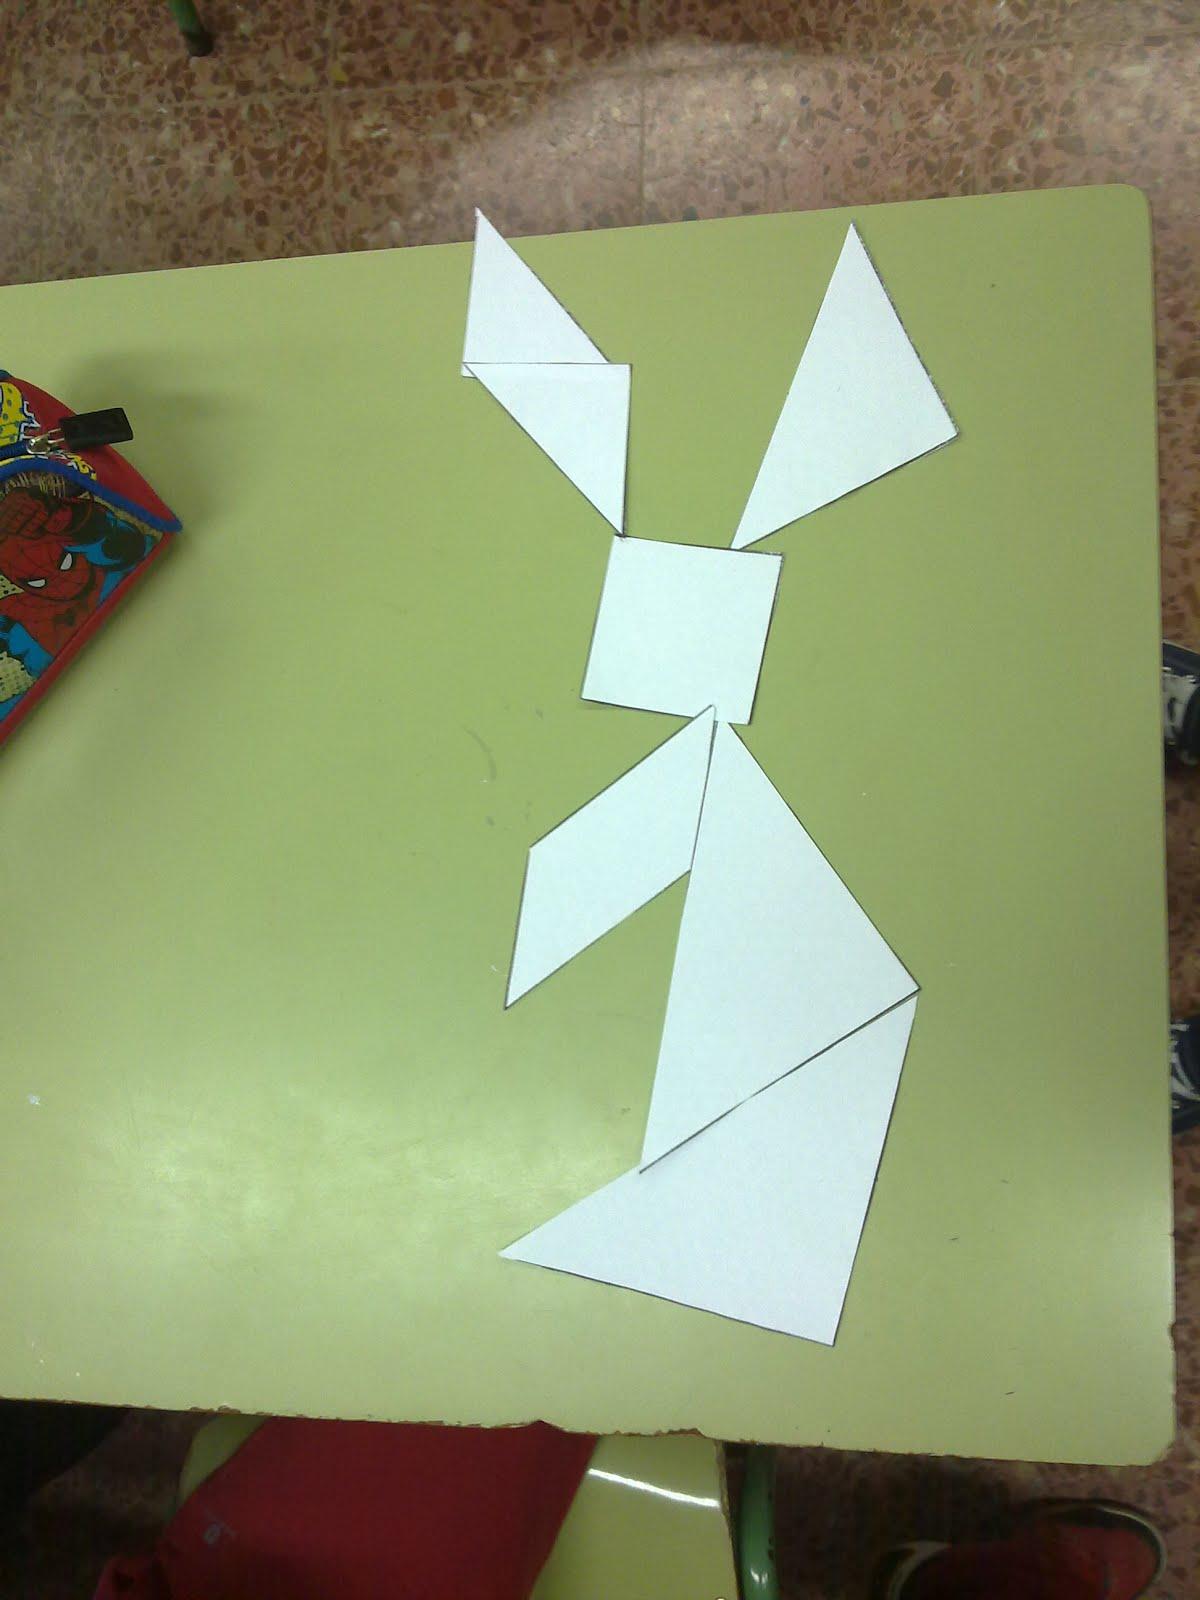 Como hacer un conejo con figuras geometricas imagui - Como hacer figuras con chuches ...